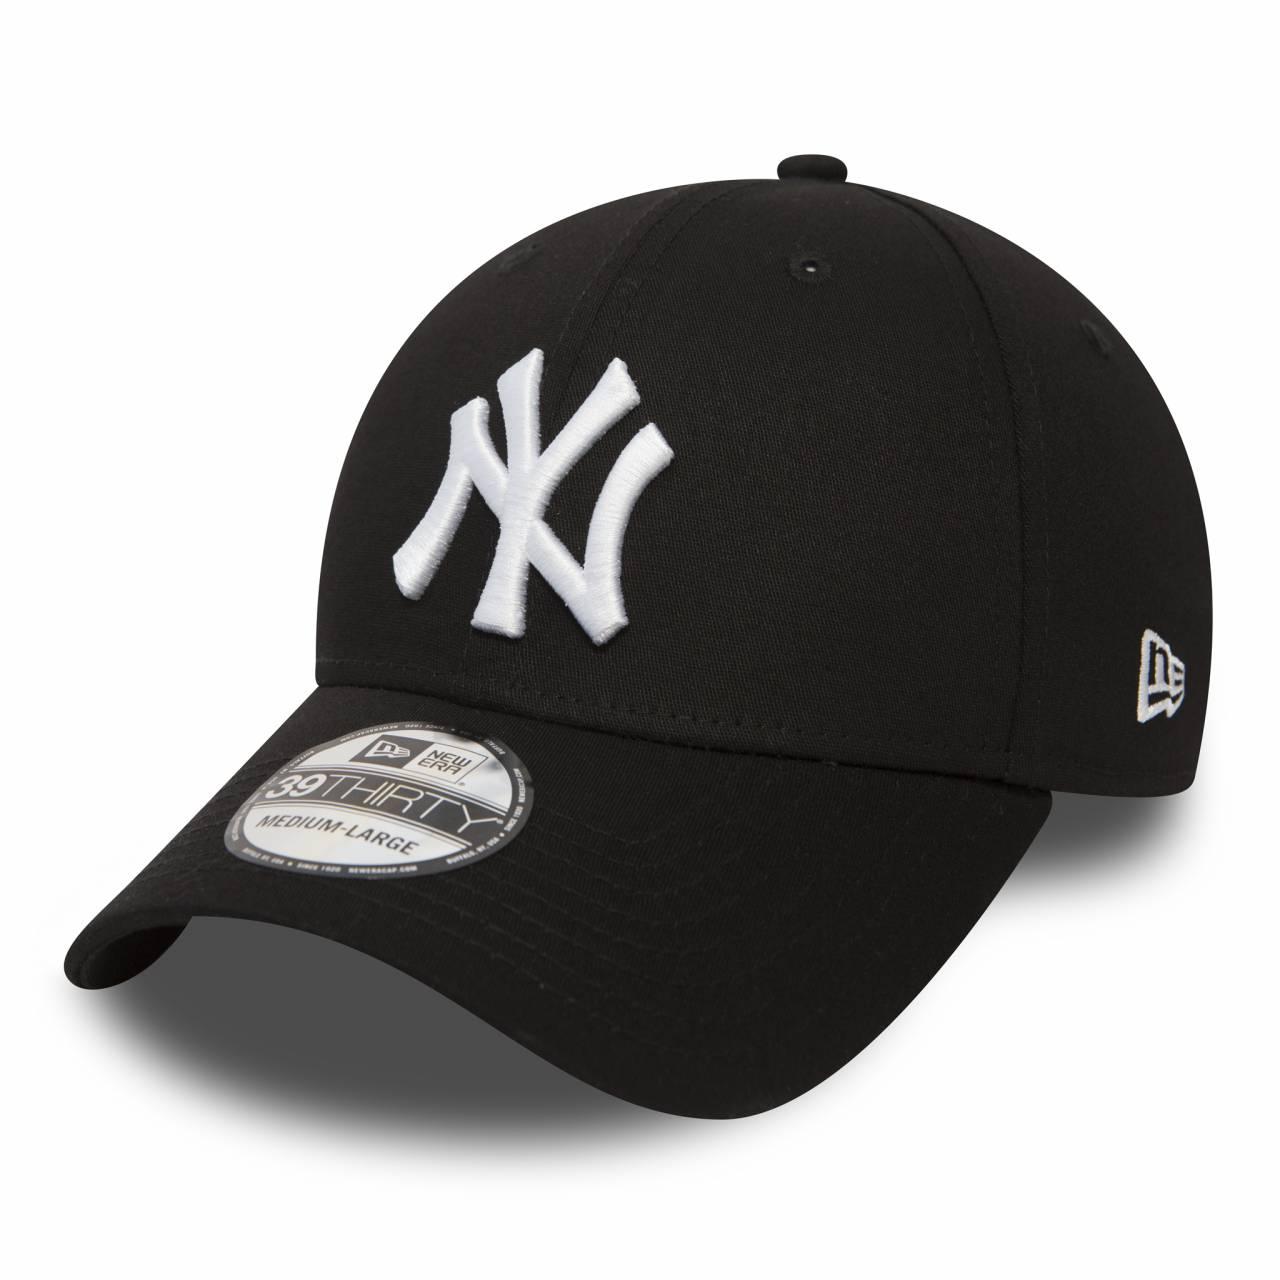 10145638 39THIRTY NEW YORK YANKEES STRETCH BLACK/WHITE CAP